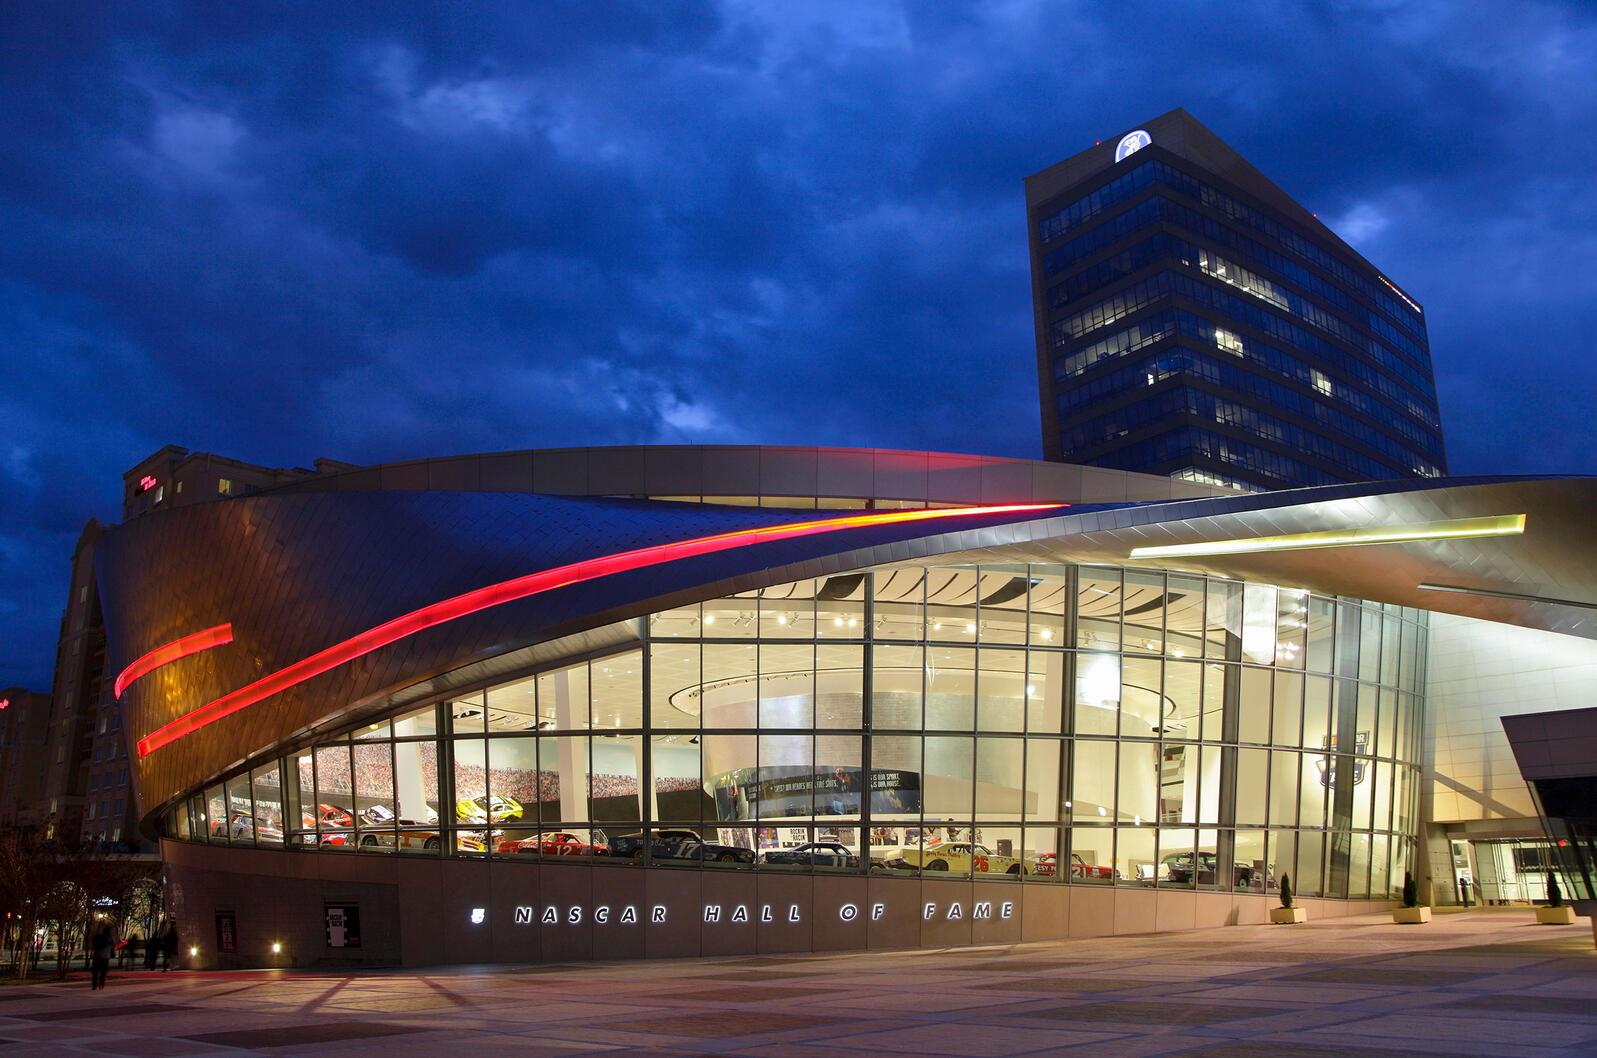 NASCAR Hall of Fame, Charlotte, North Carolina. W. G. Murray/Alamy